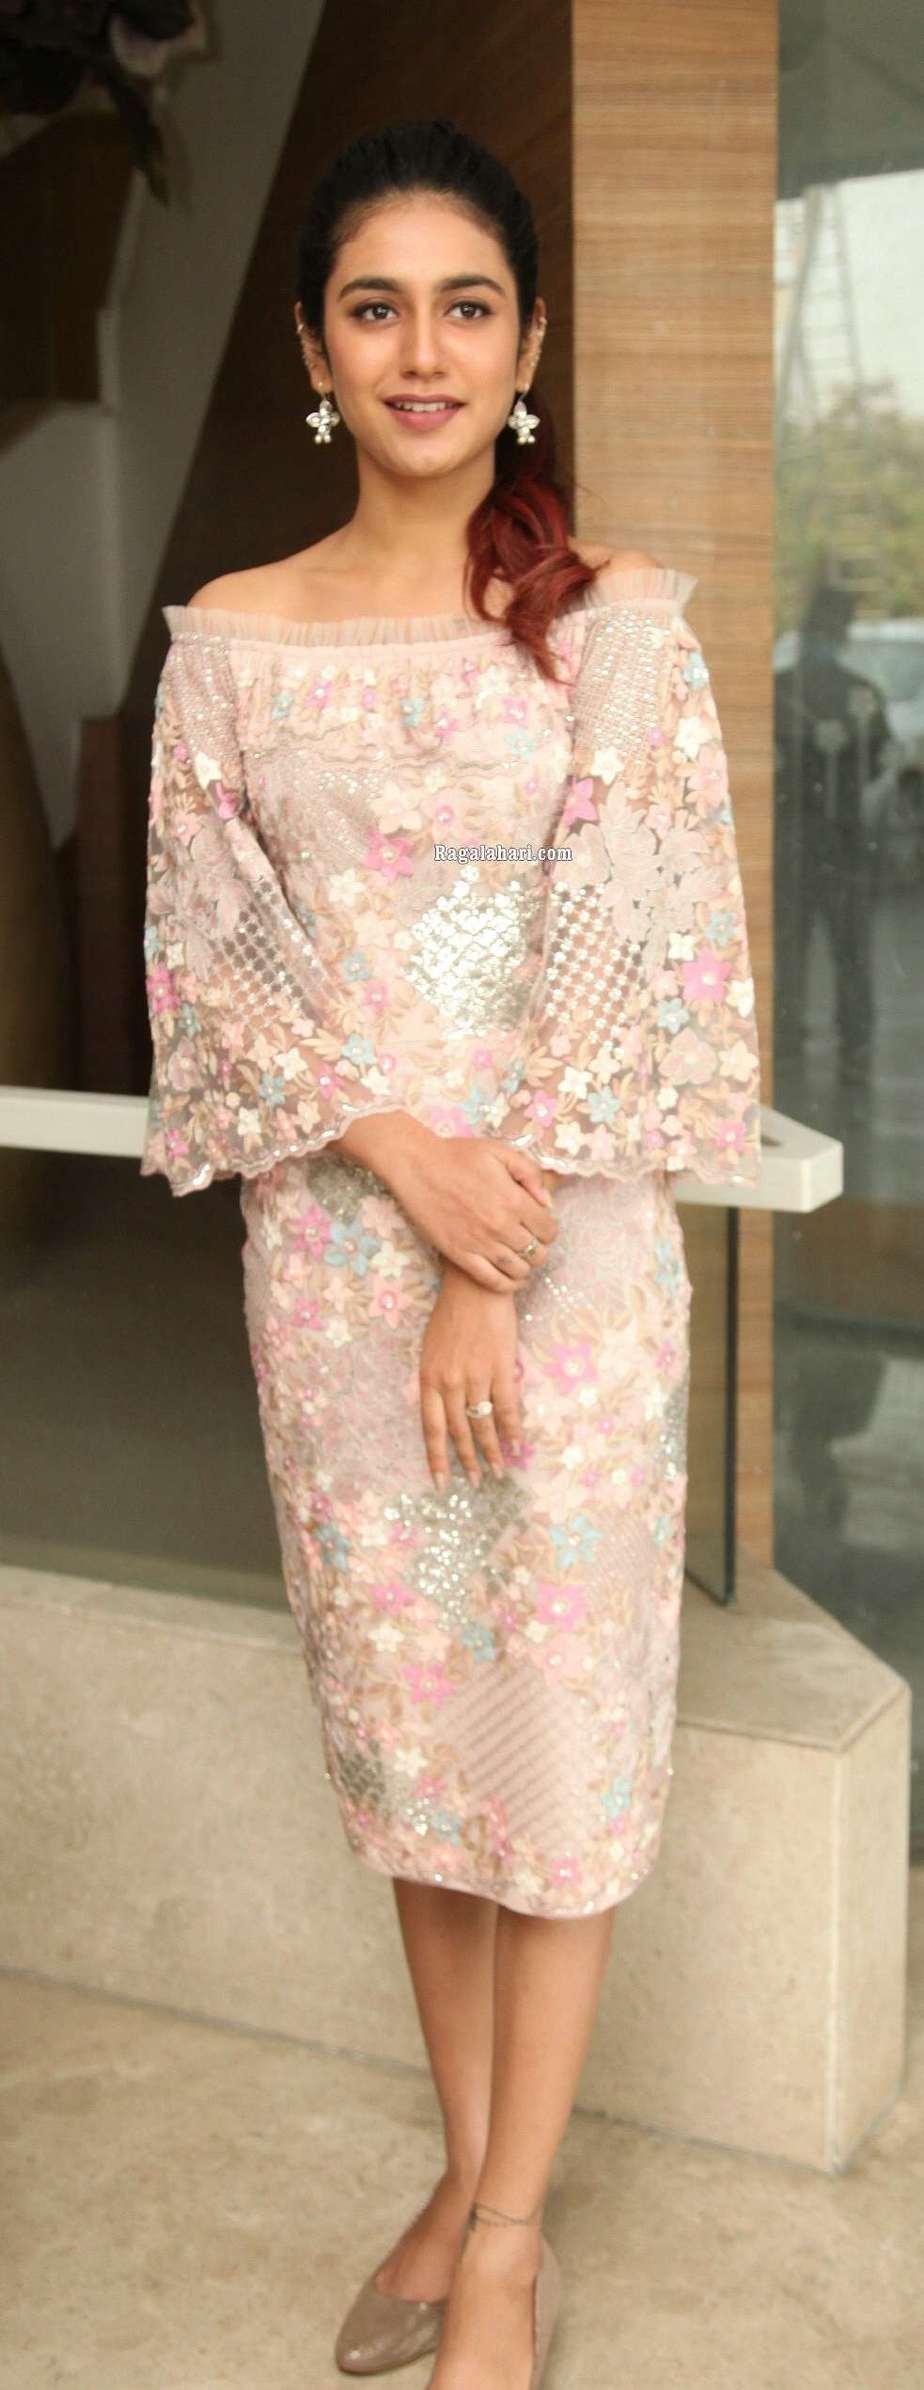 Priya Prakash Varrier in peach dress for check press meet1